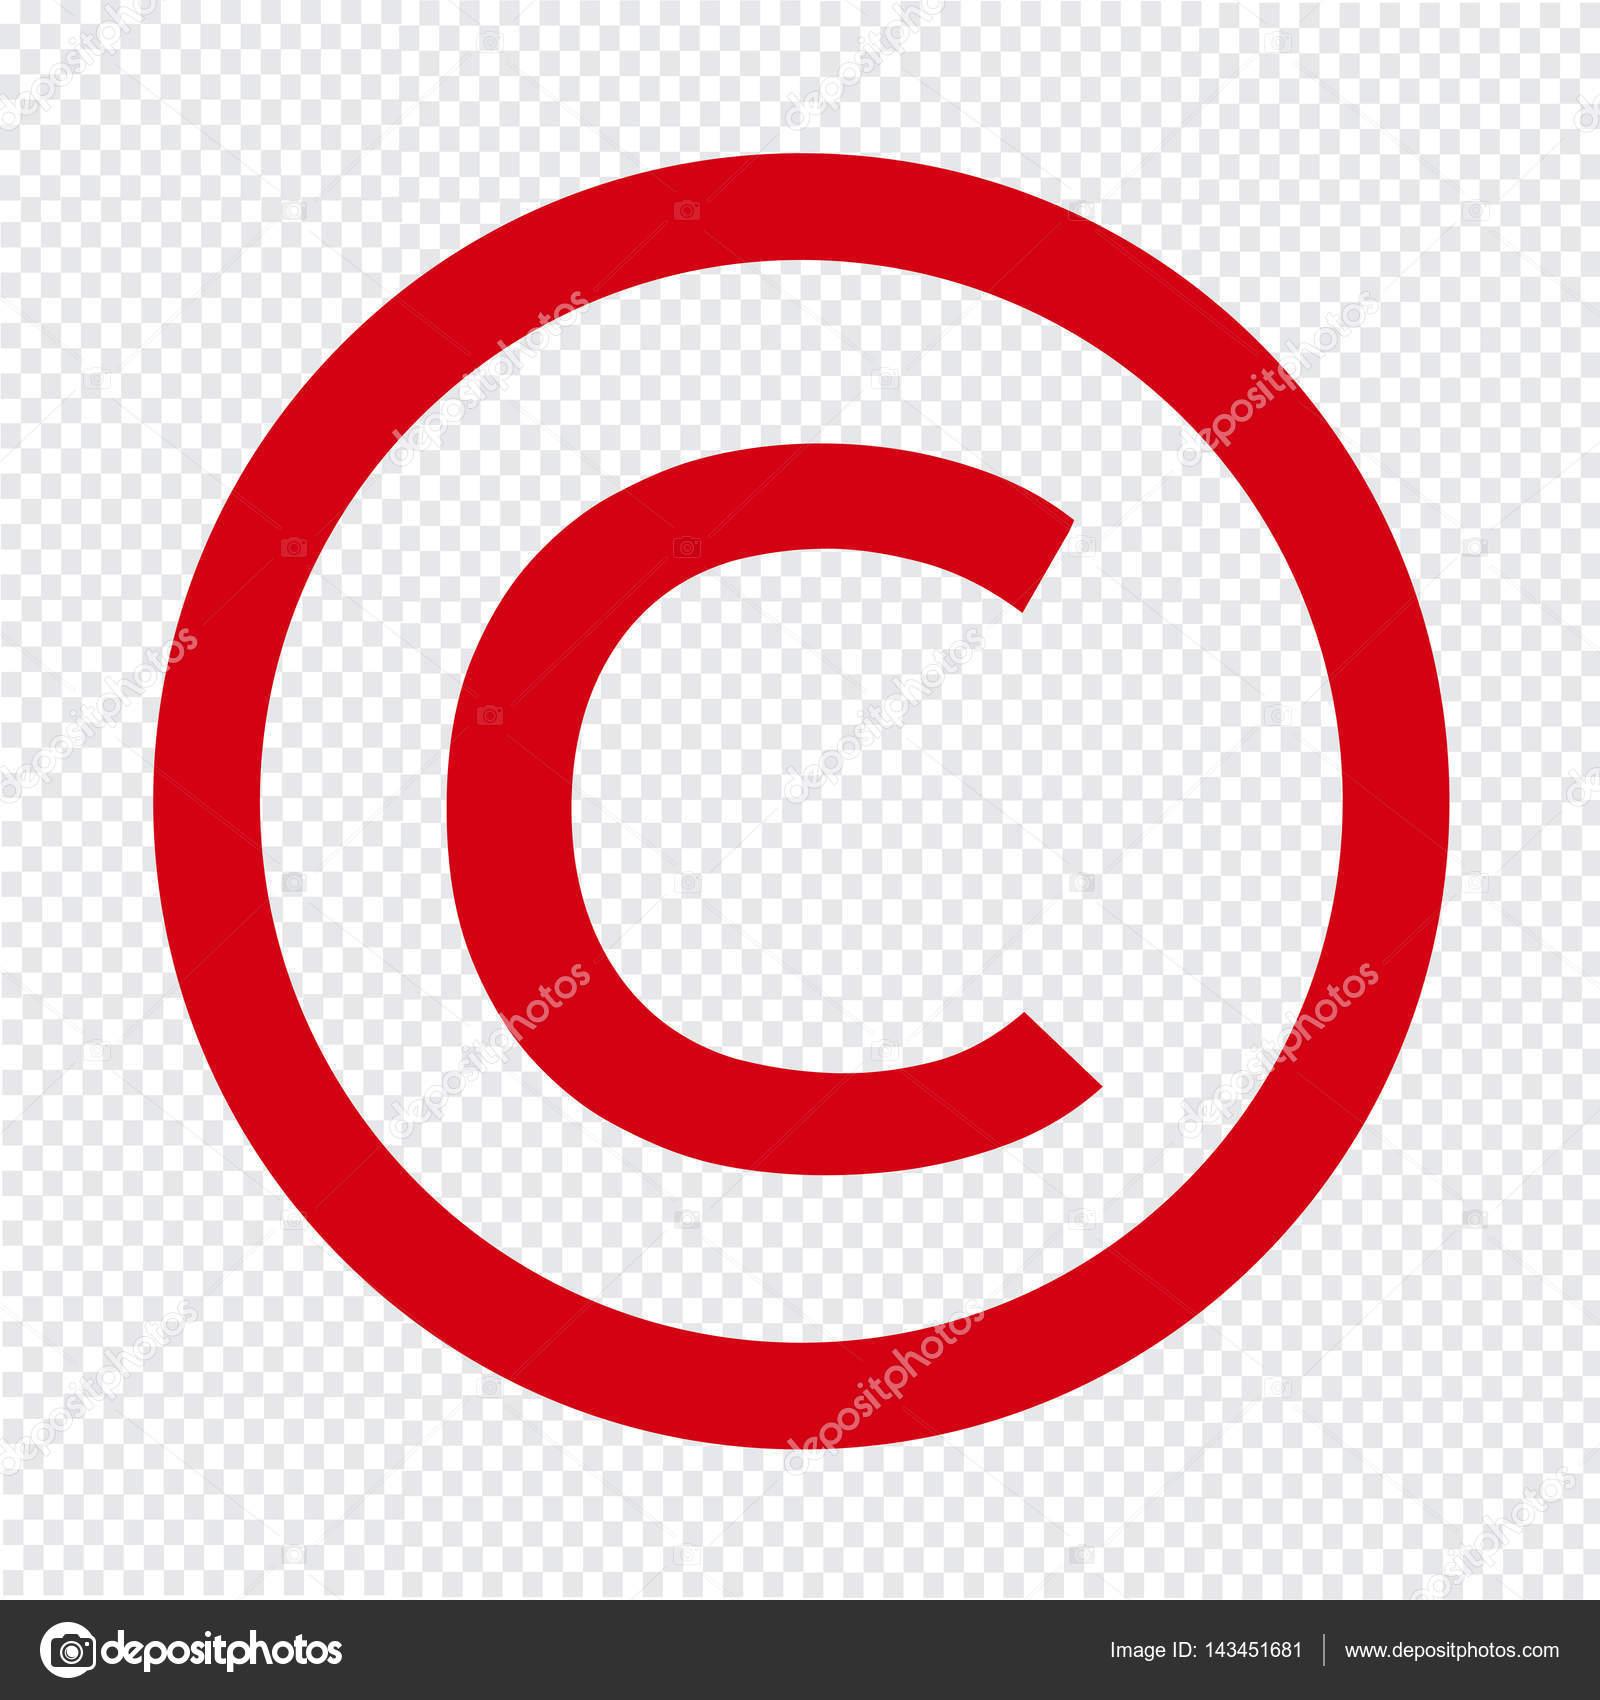 Copyright symbol icon stock vector porjai 143451681 copyright symbol icon stock vector 143451681 biocorpaavc